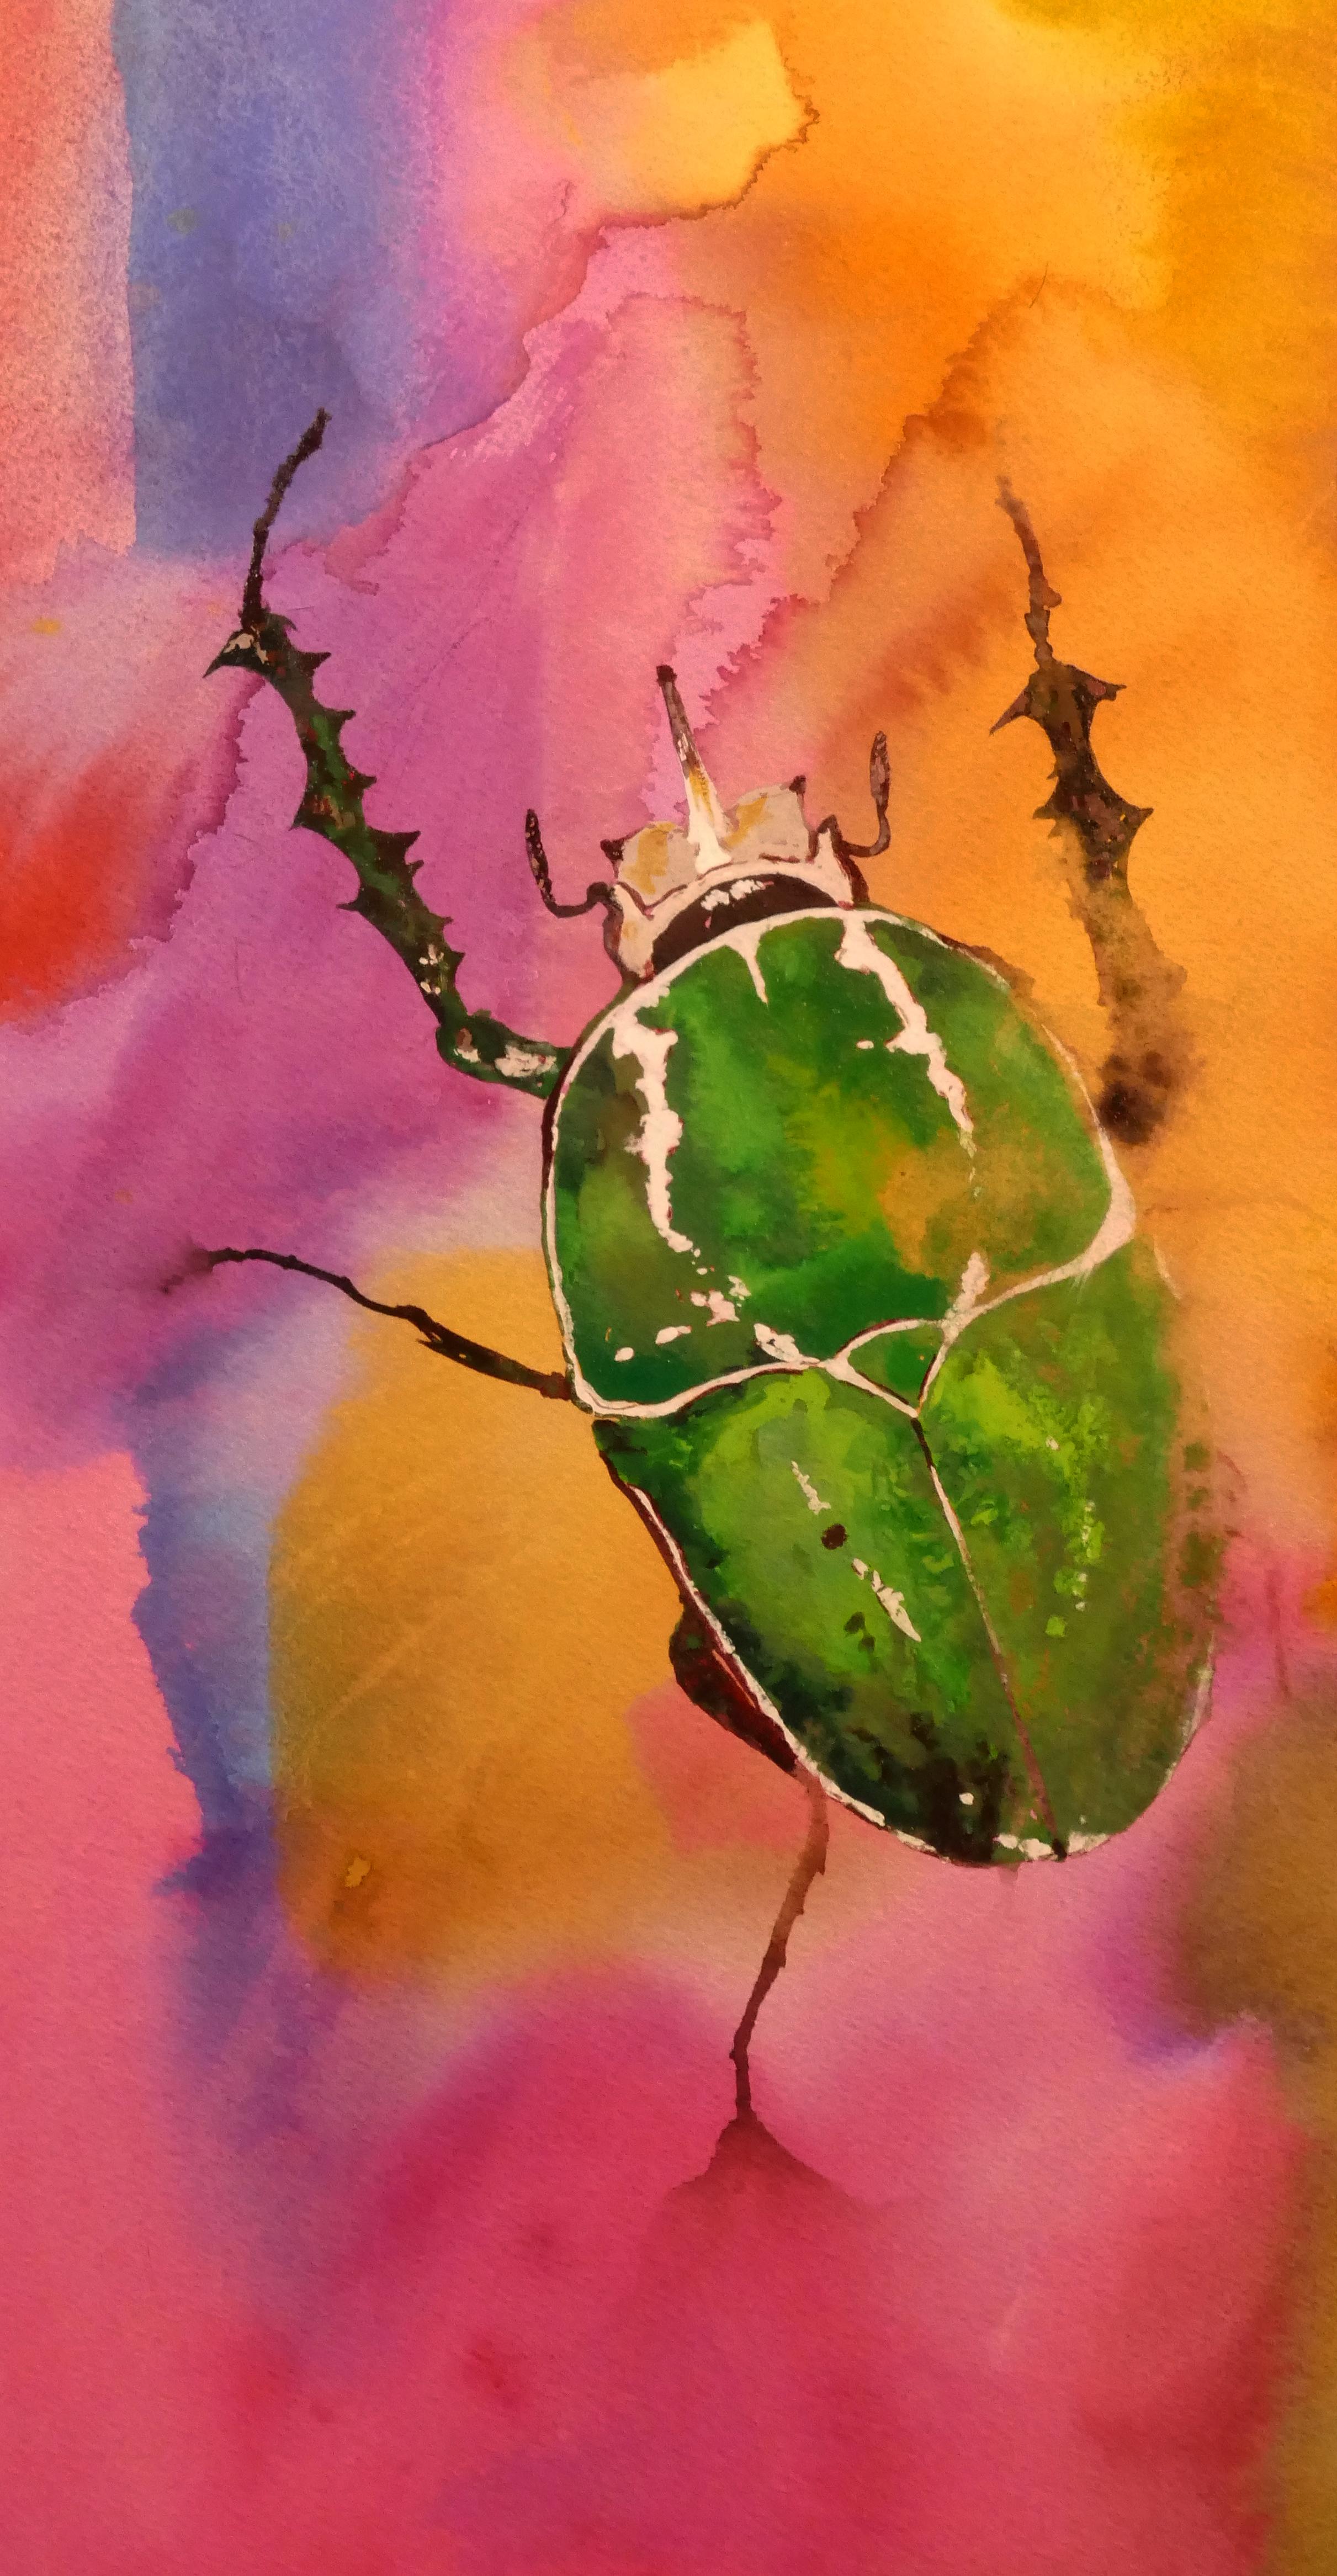 Giant Flower Beetle